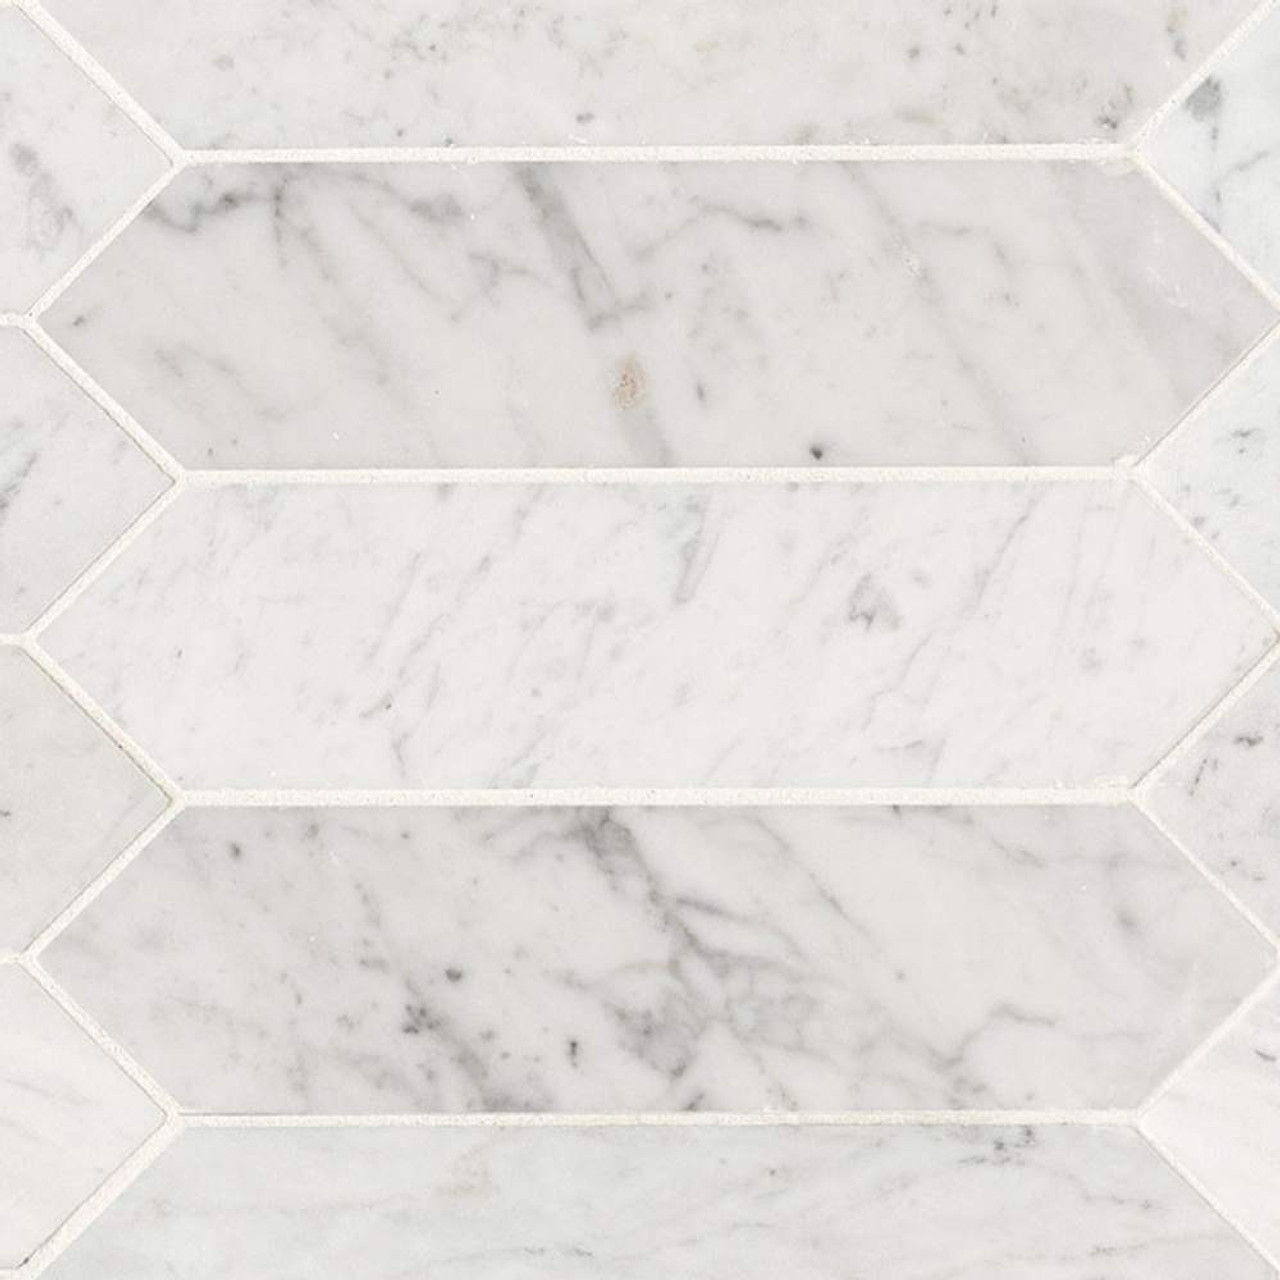 ms international specialty shapes wall series carrara white 3x12 honed picket shape tile smot car pk3x12h